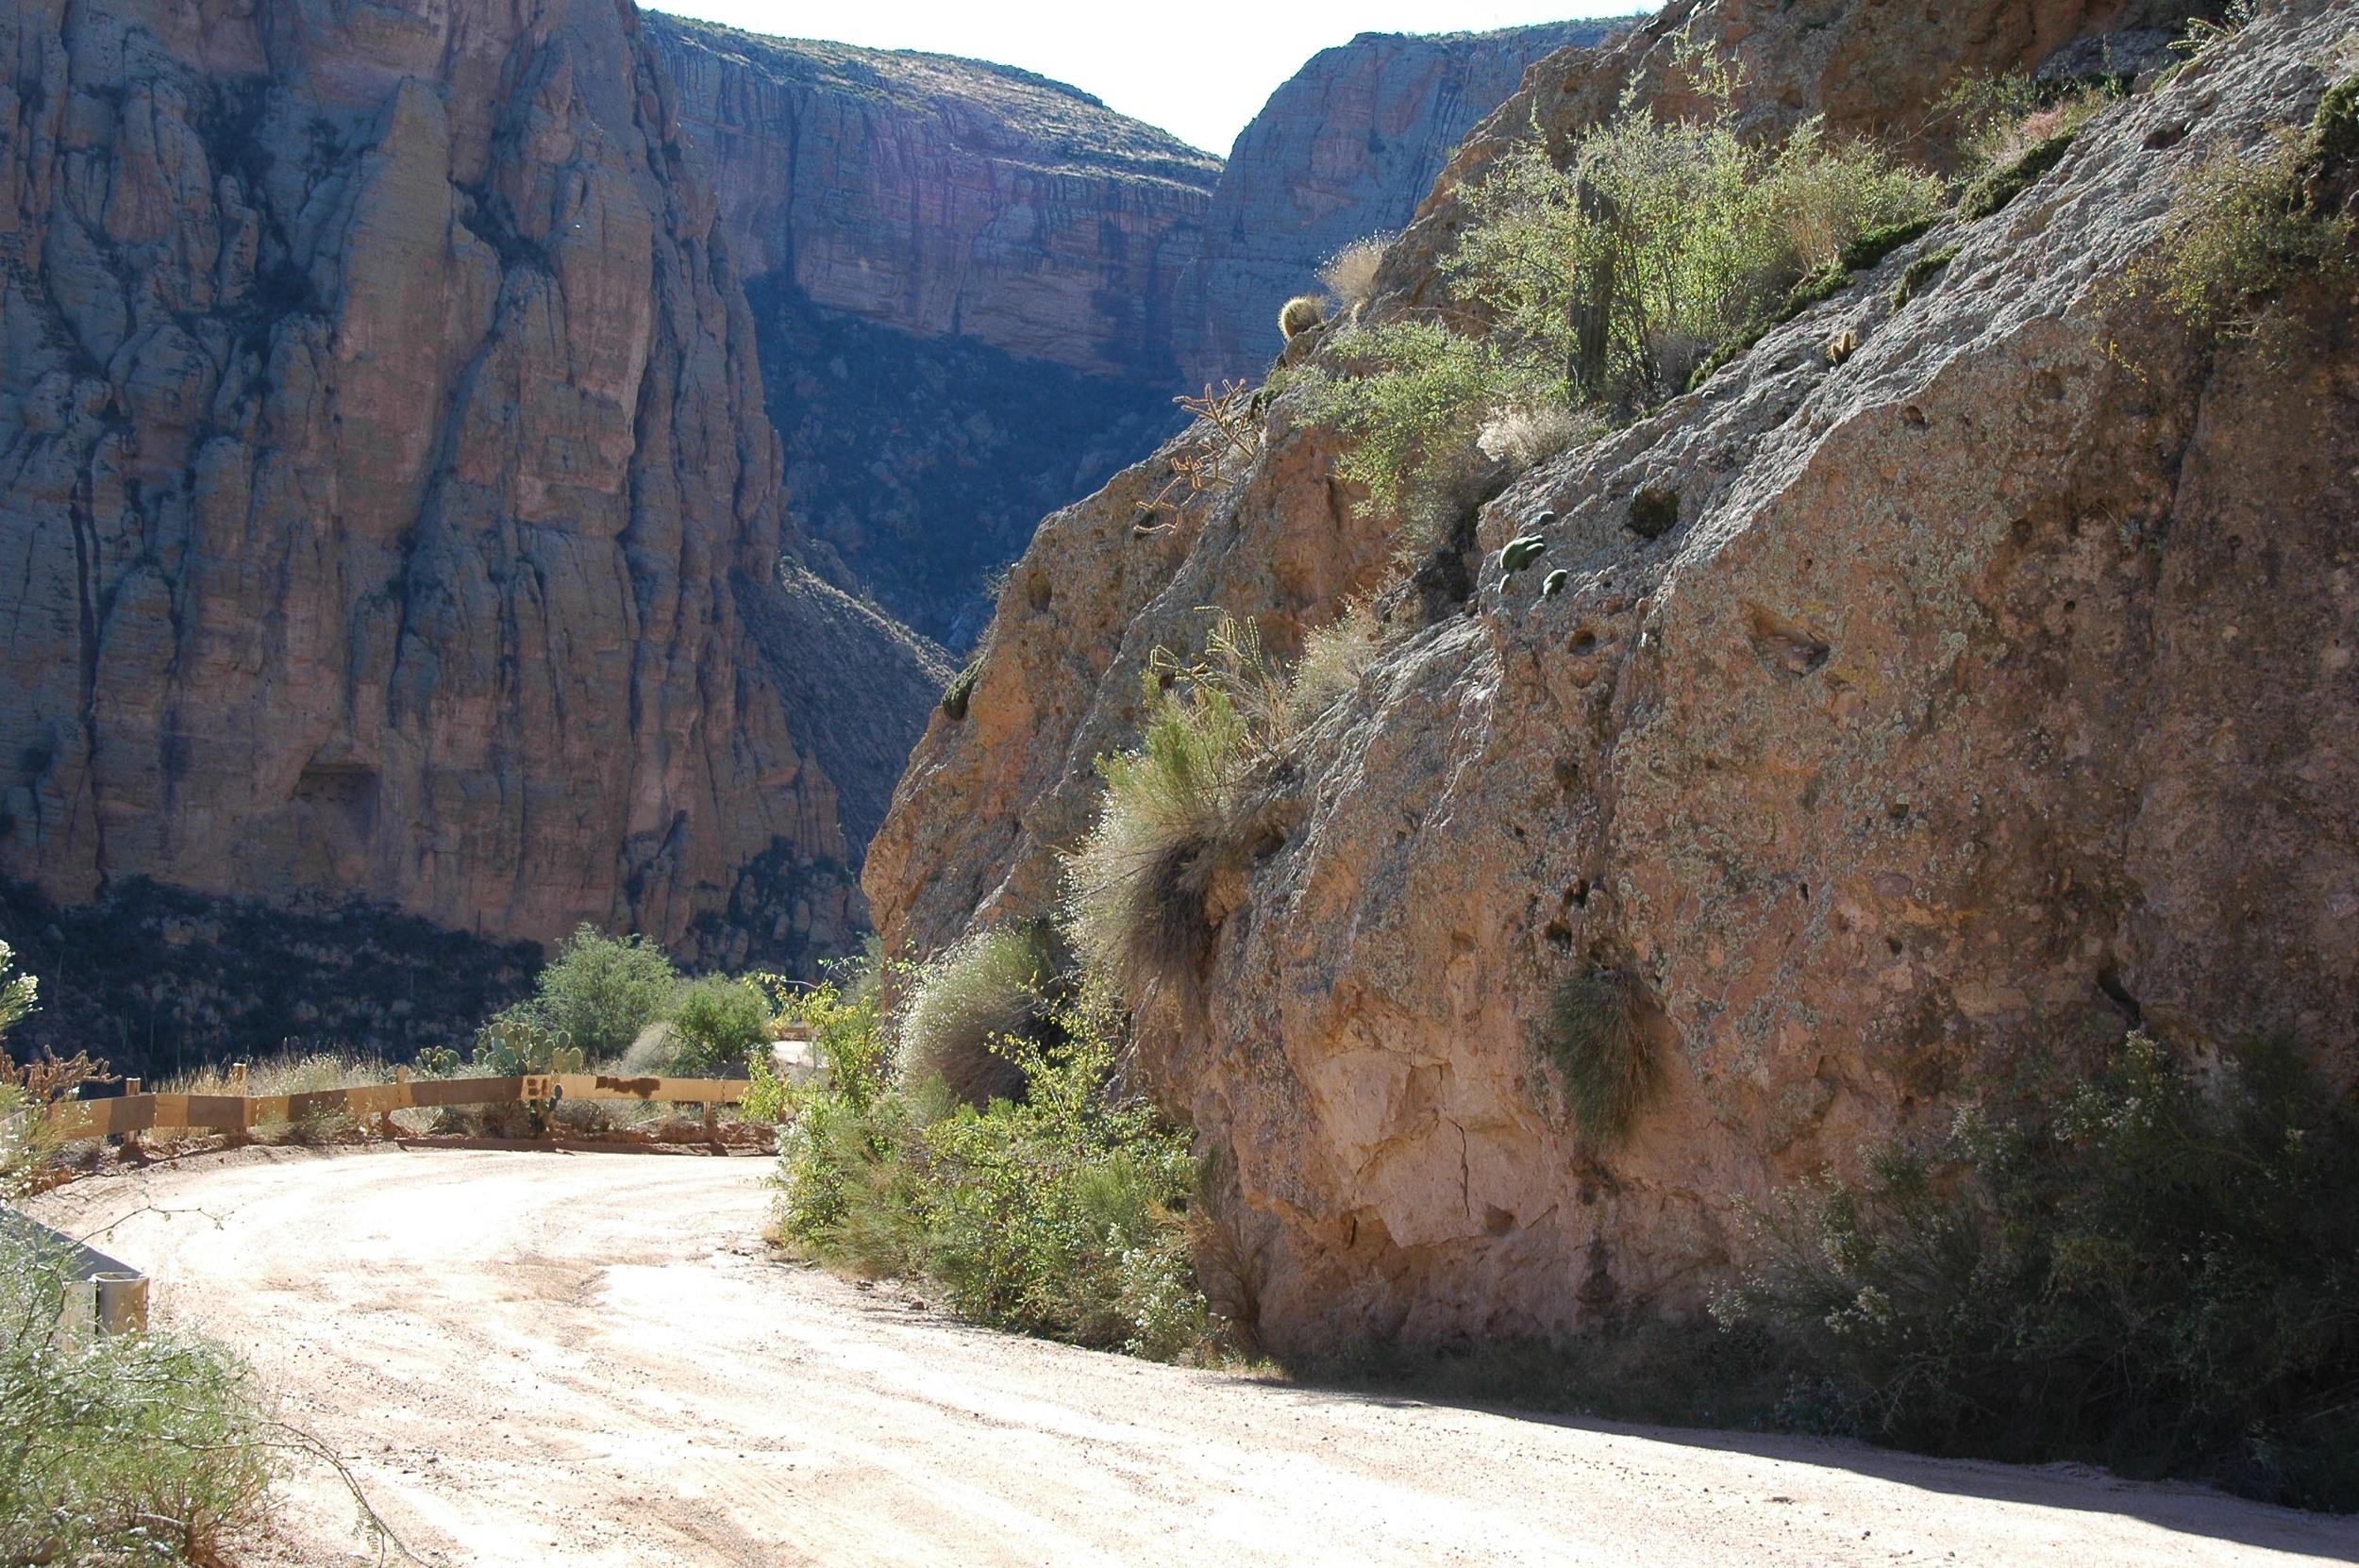 canyon-2_15165426059_o.jpg